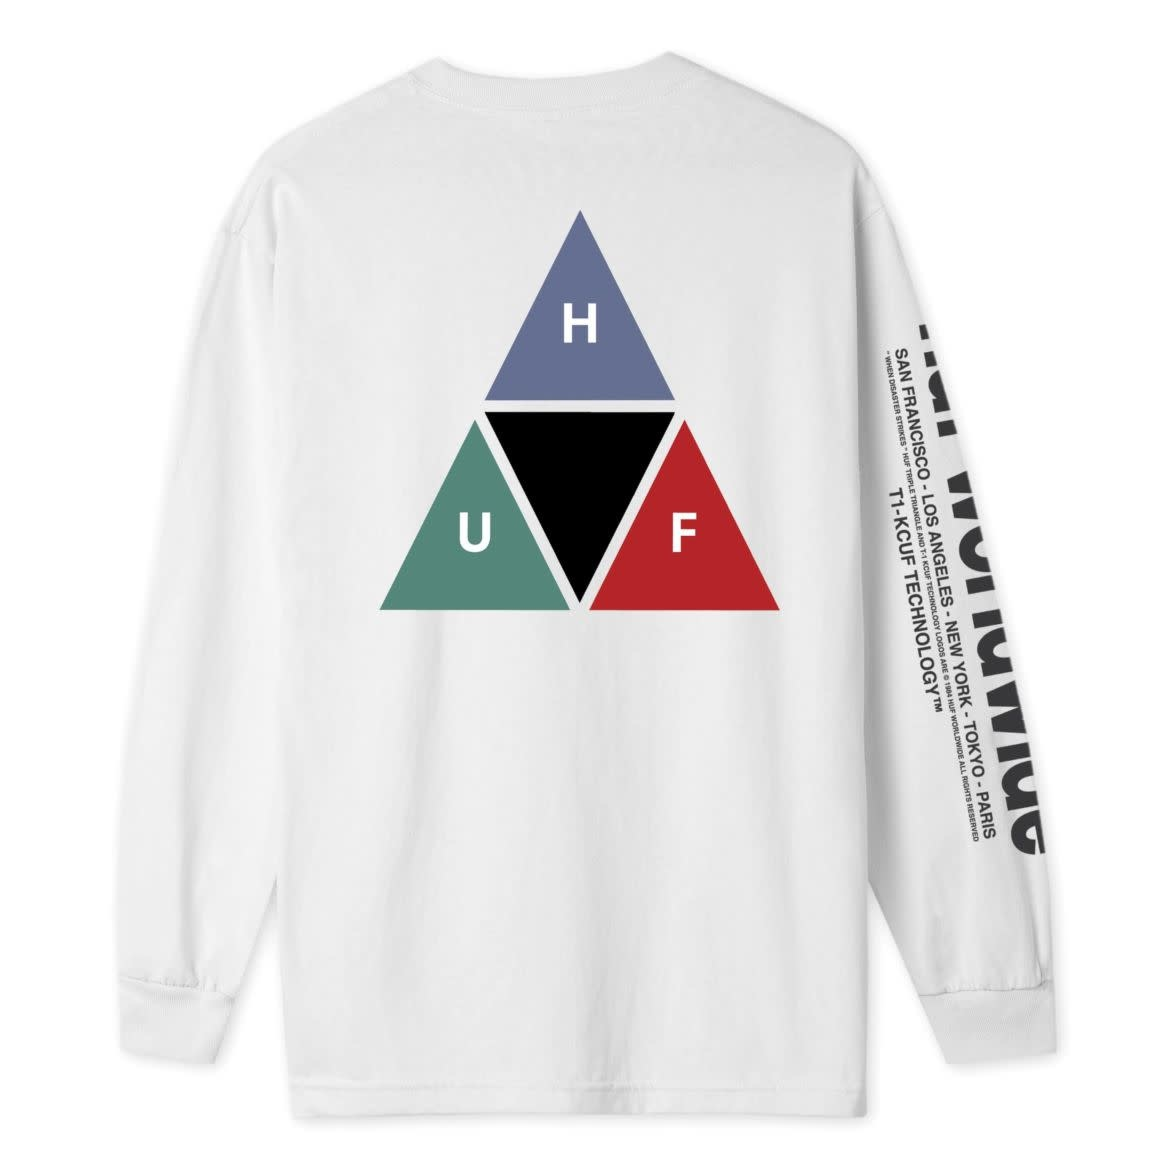 HUF Huf Prism Triple Triangle Longsleeve - White